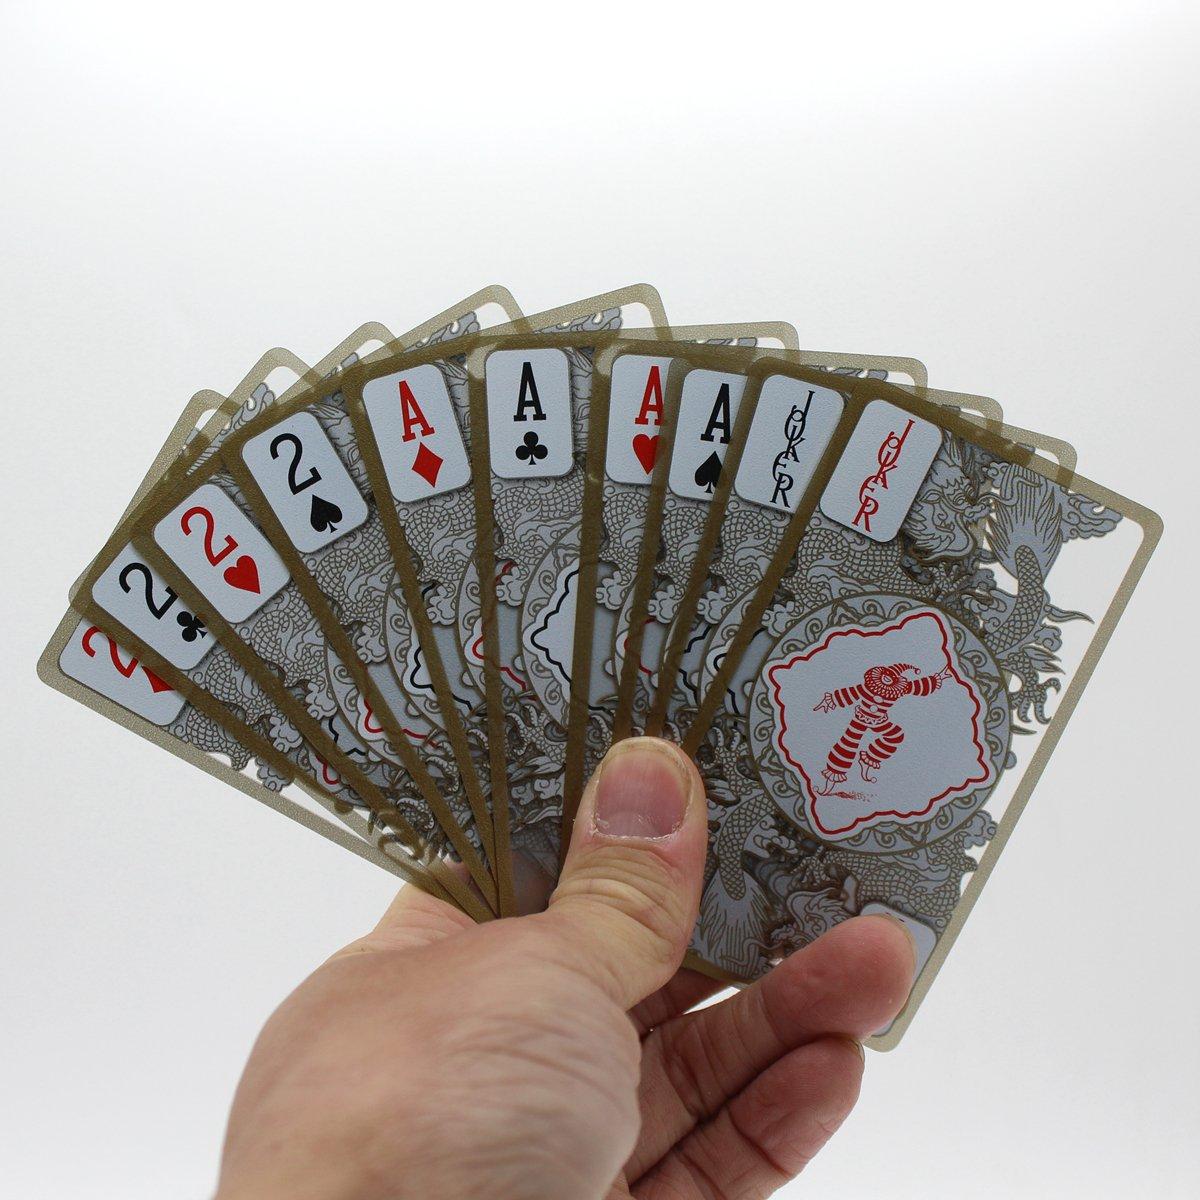 BNENIU Waterproof Transparent Plastic Poker Gold Edge Playing Cards Dragon Pattern BENNIU